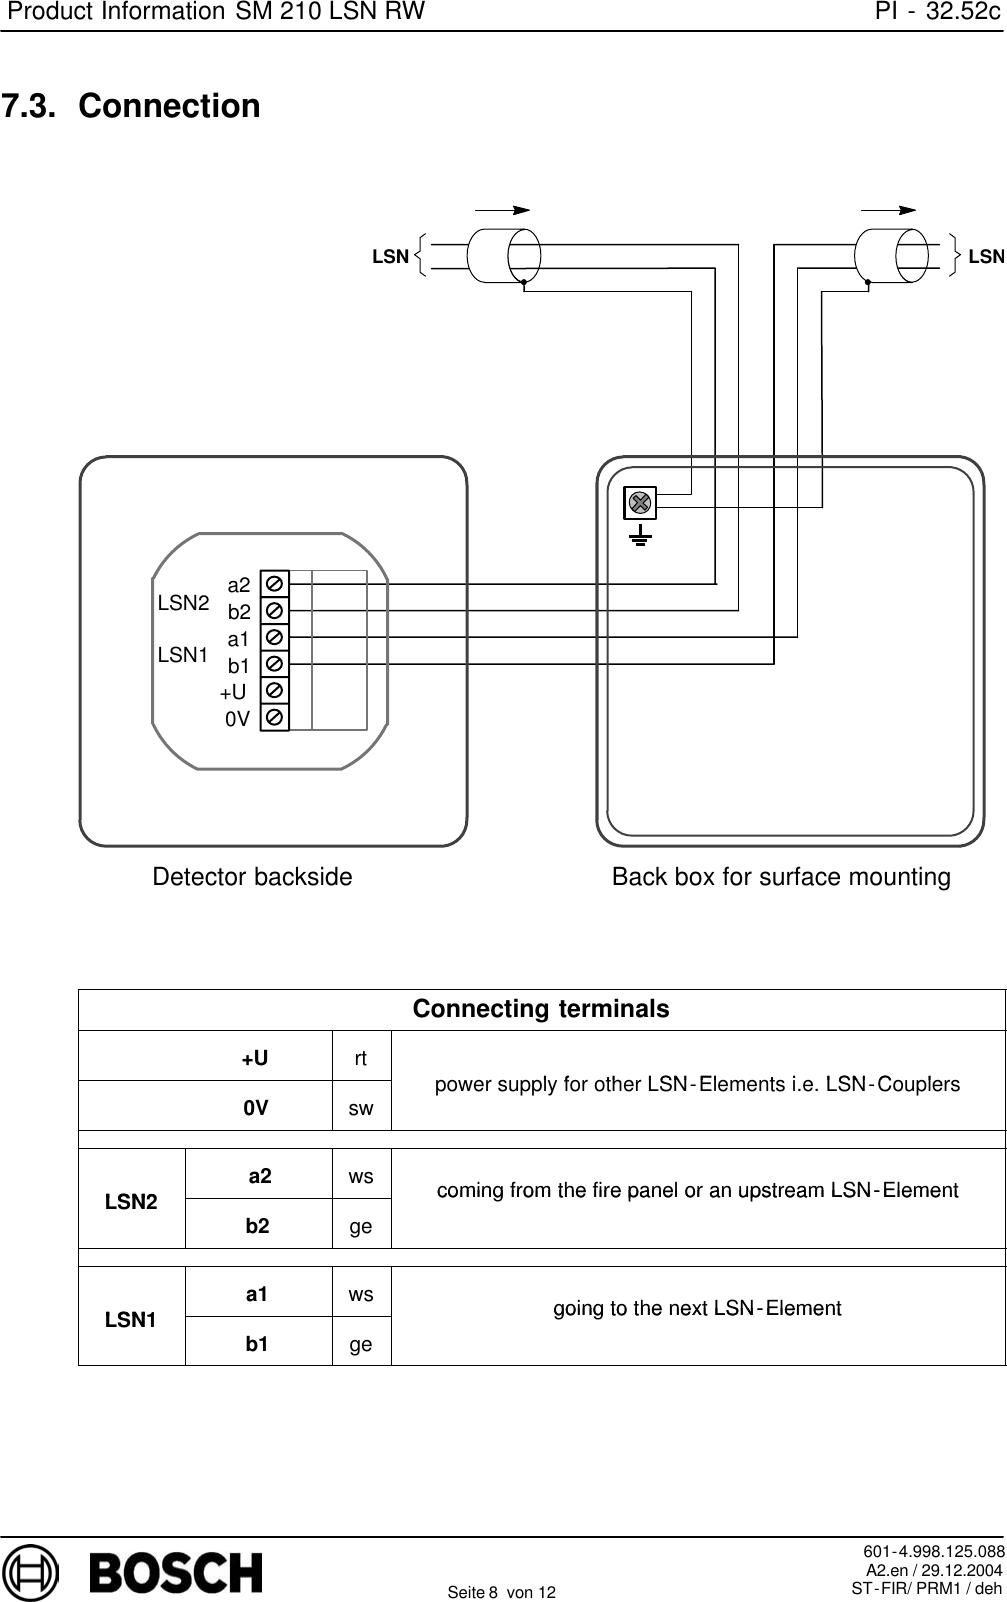 Boschhome Bosch Appliances Smoke Alarm Sm 210 Lsn Rw Users Manual ...